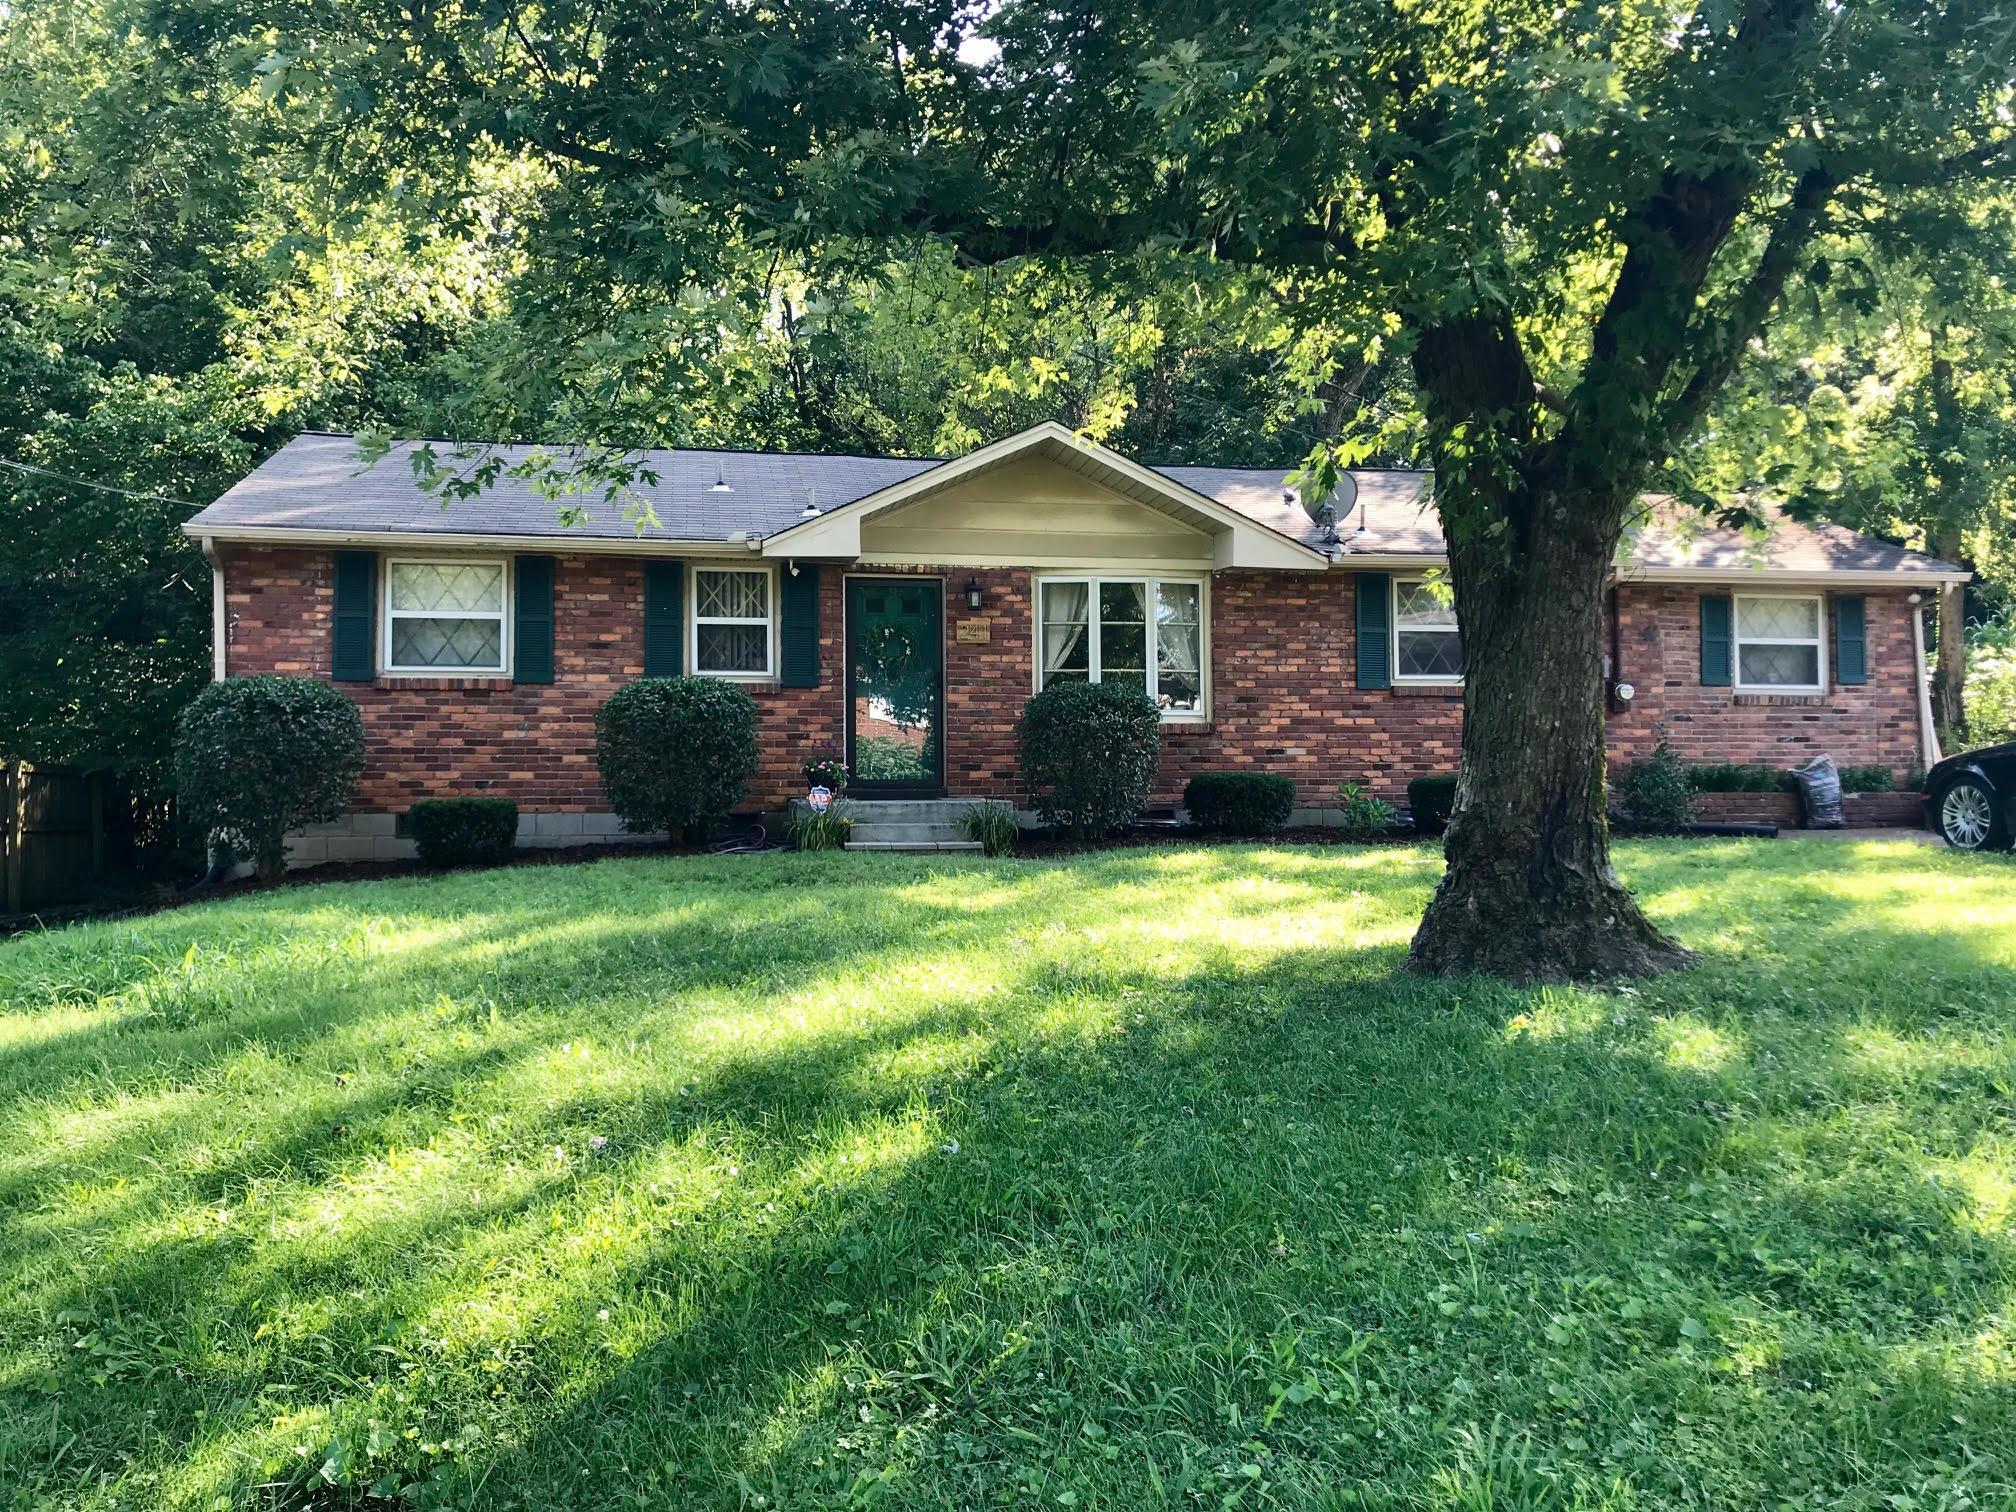 241 Willow Lane, Nashville, TN 37211 - Nashville, TN real estate listing